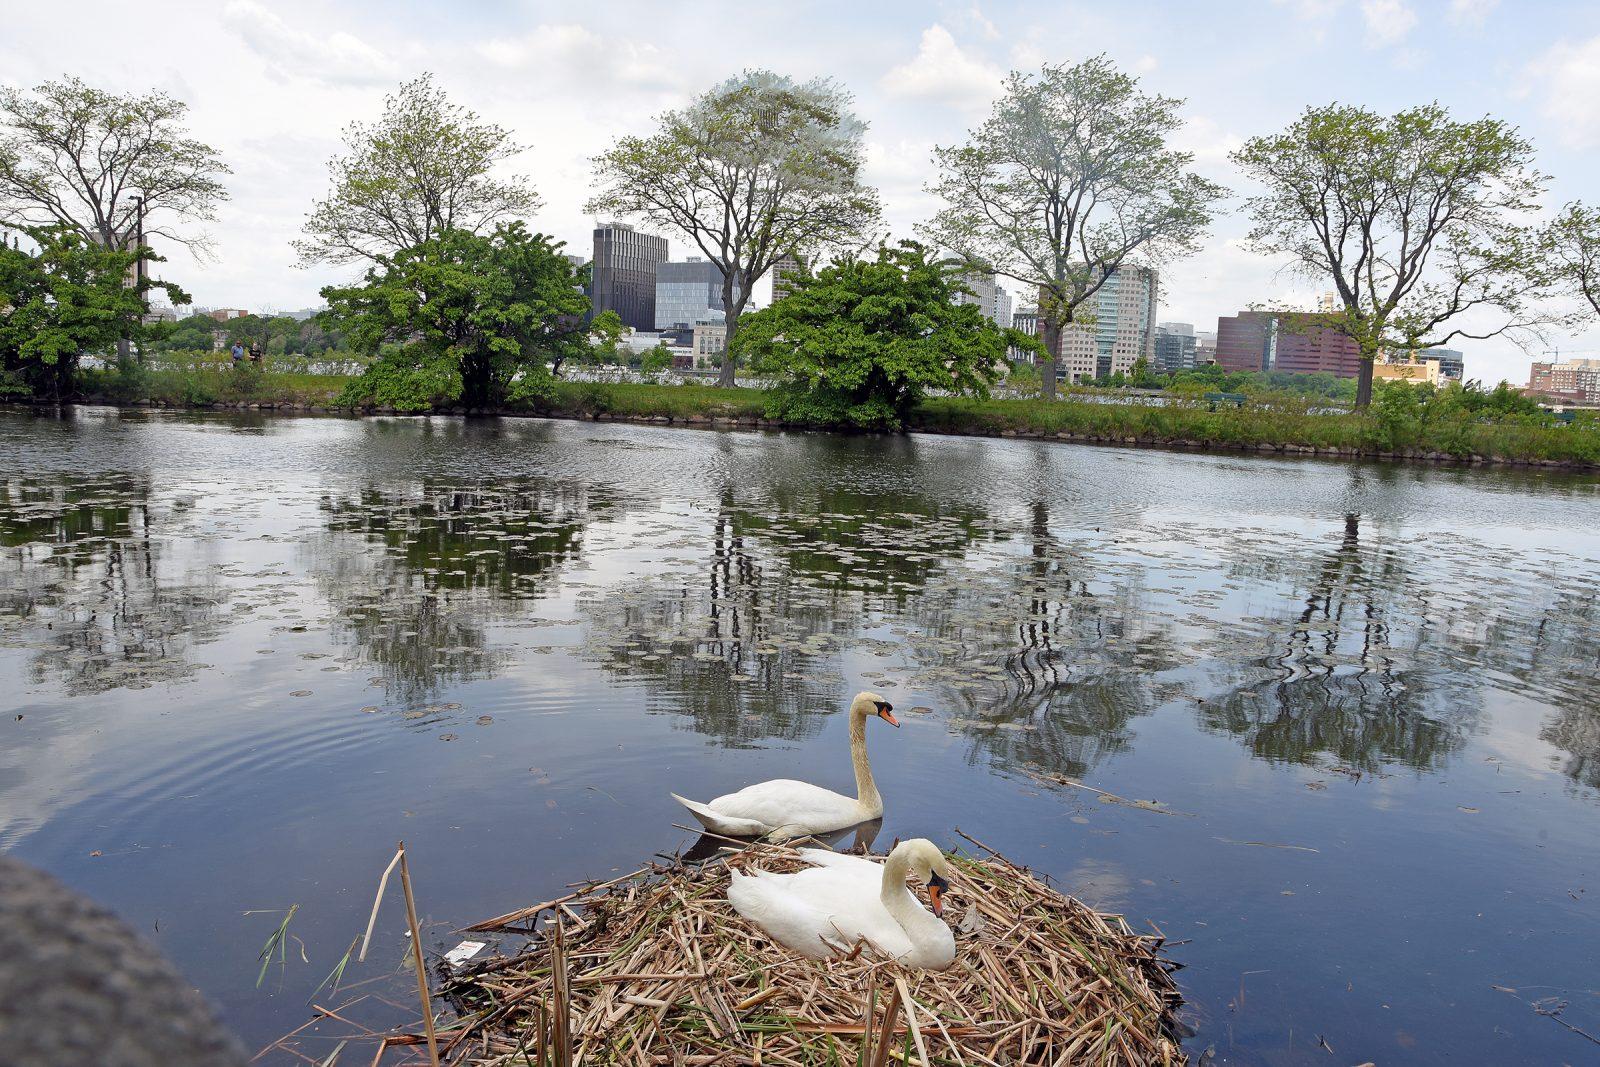 Swans nest on banks of Charles River